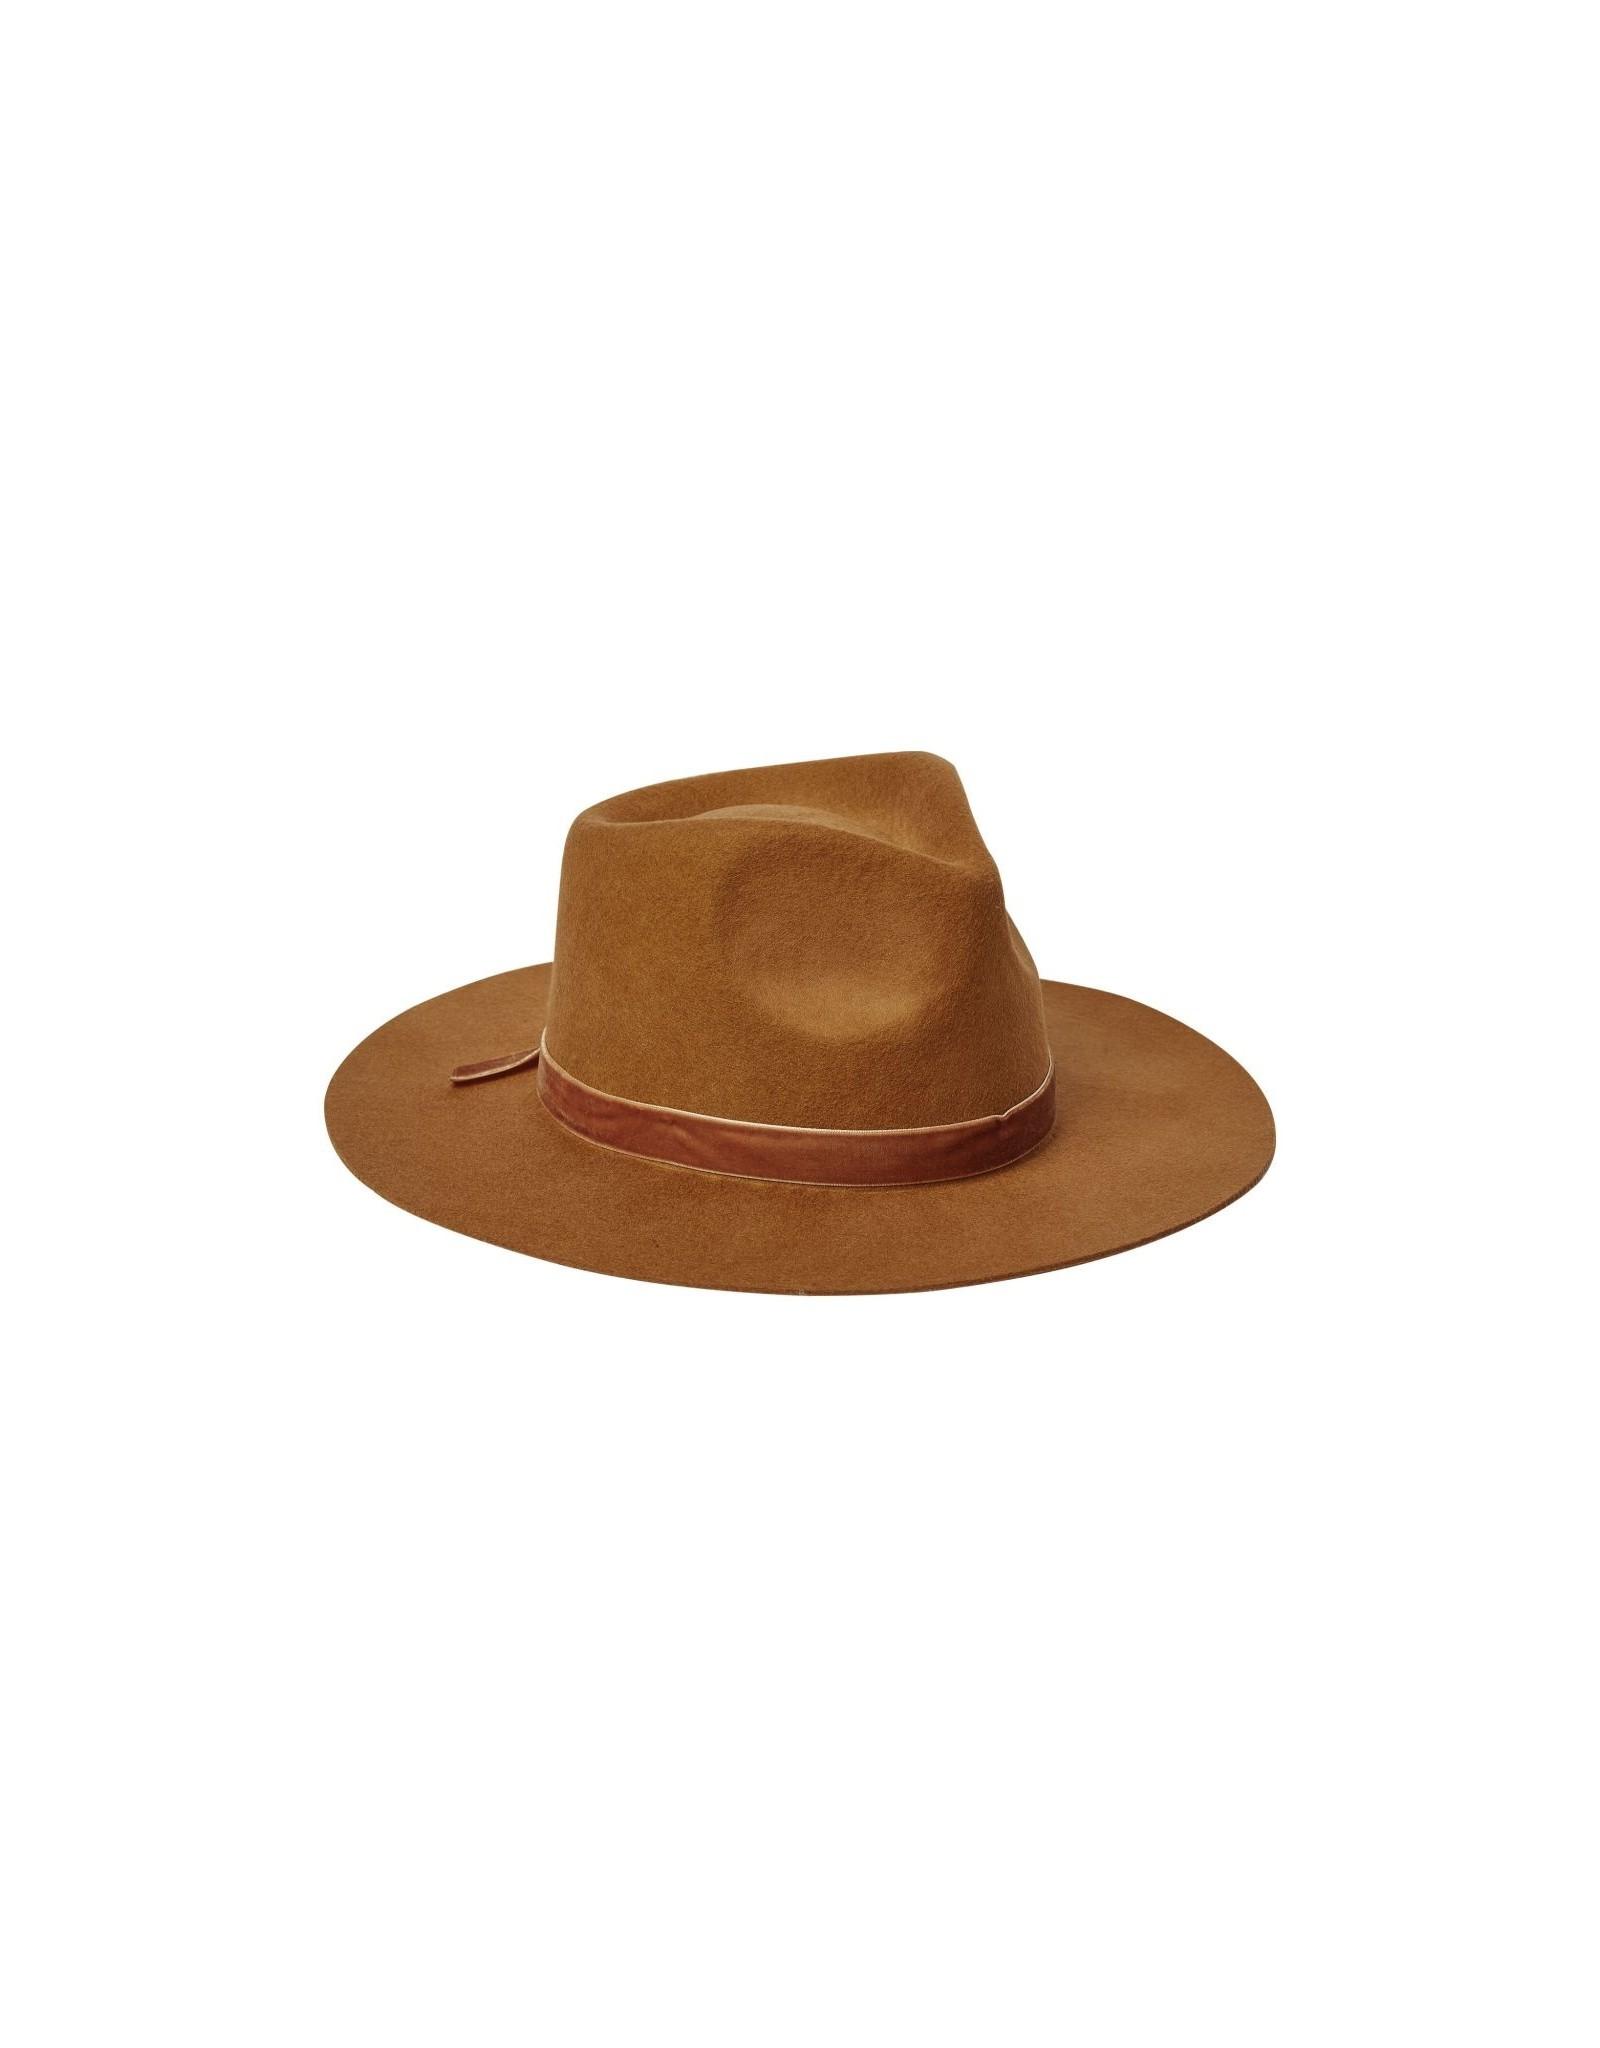 Rylee and Cru rancher hat- rust